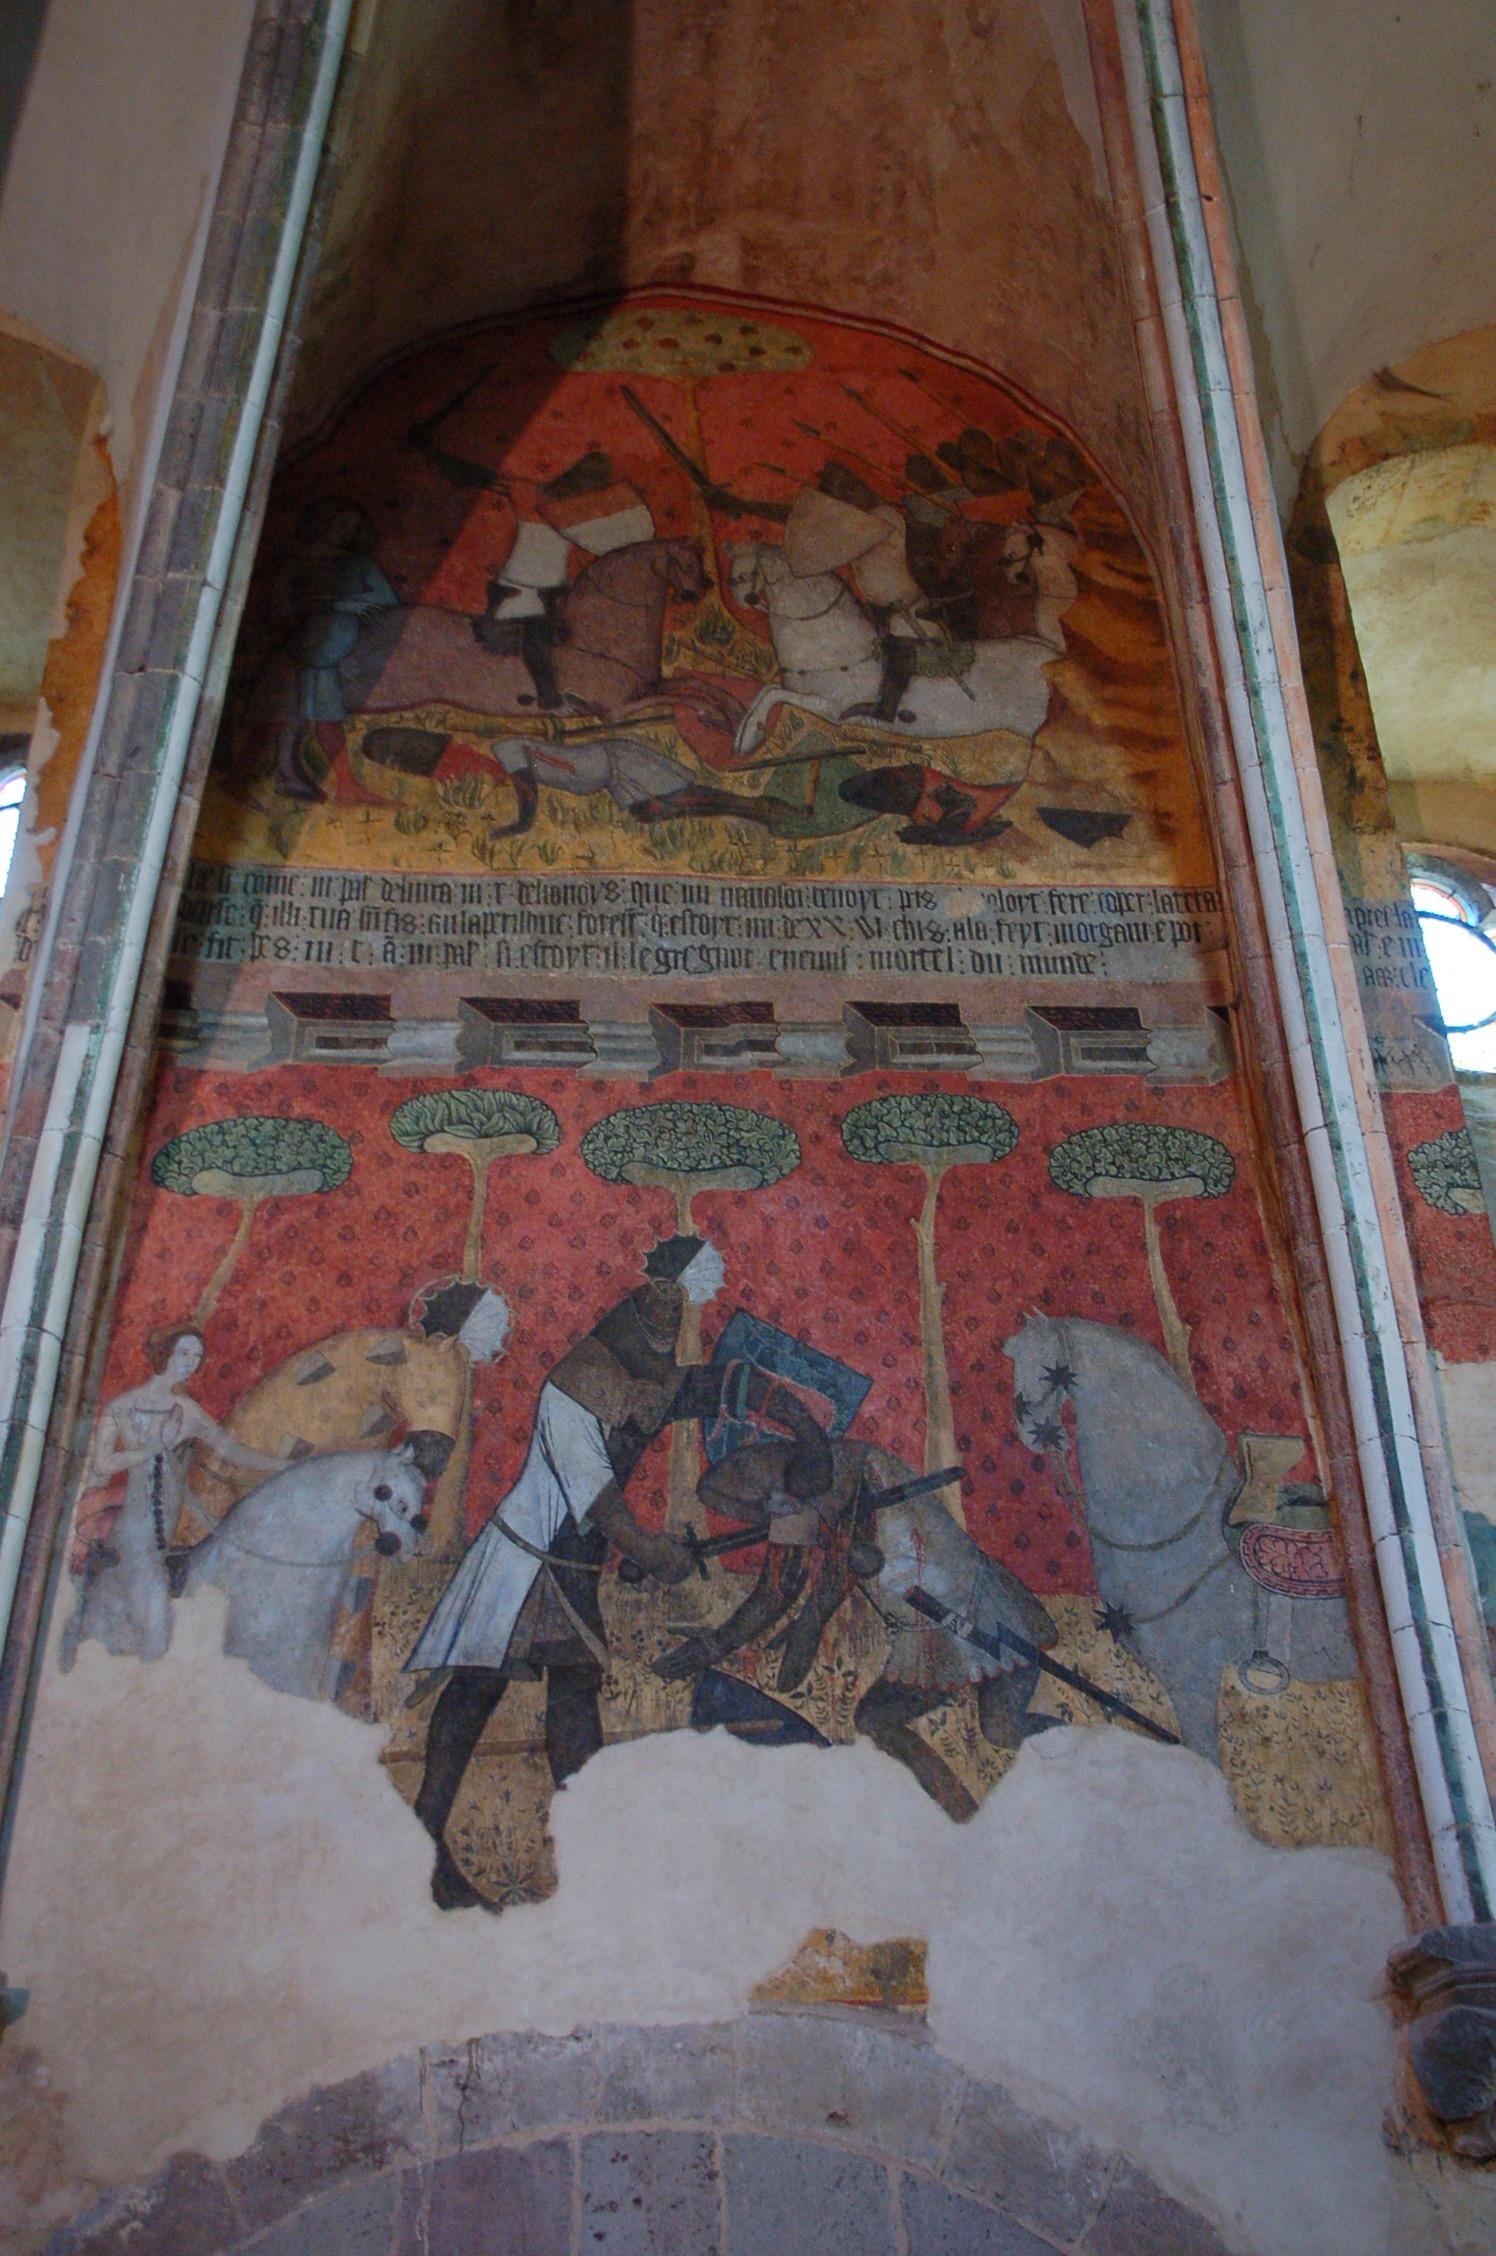 file peinture murale dans logis seigneurial de saint On peinture metallisee murale